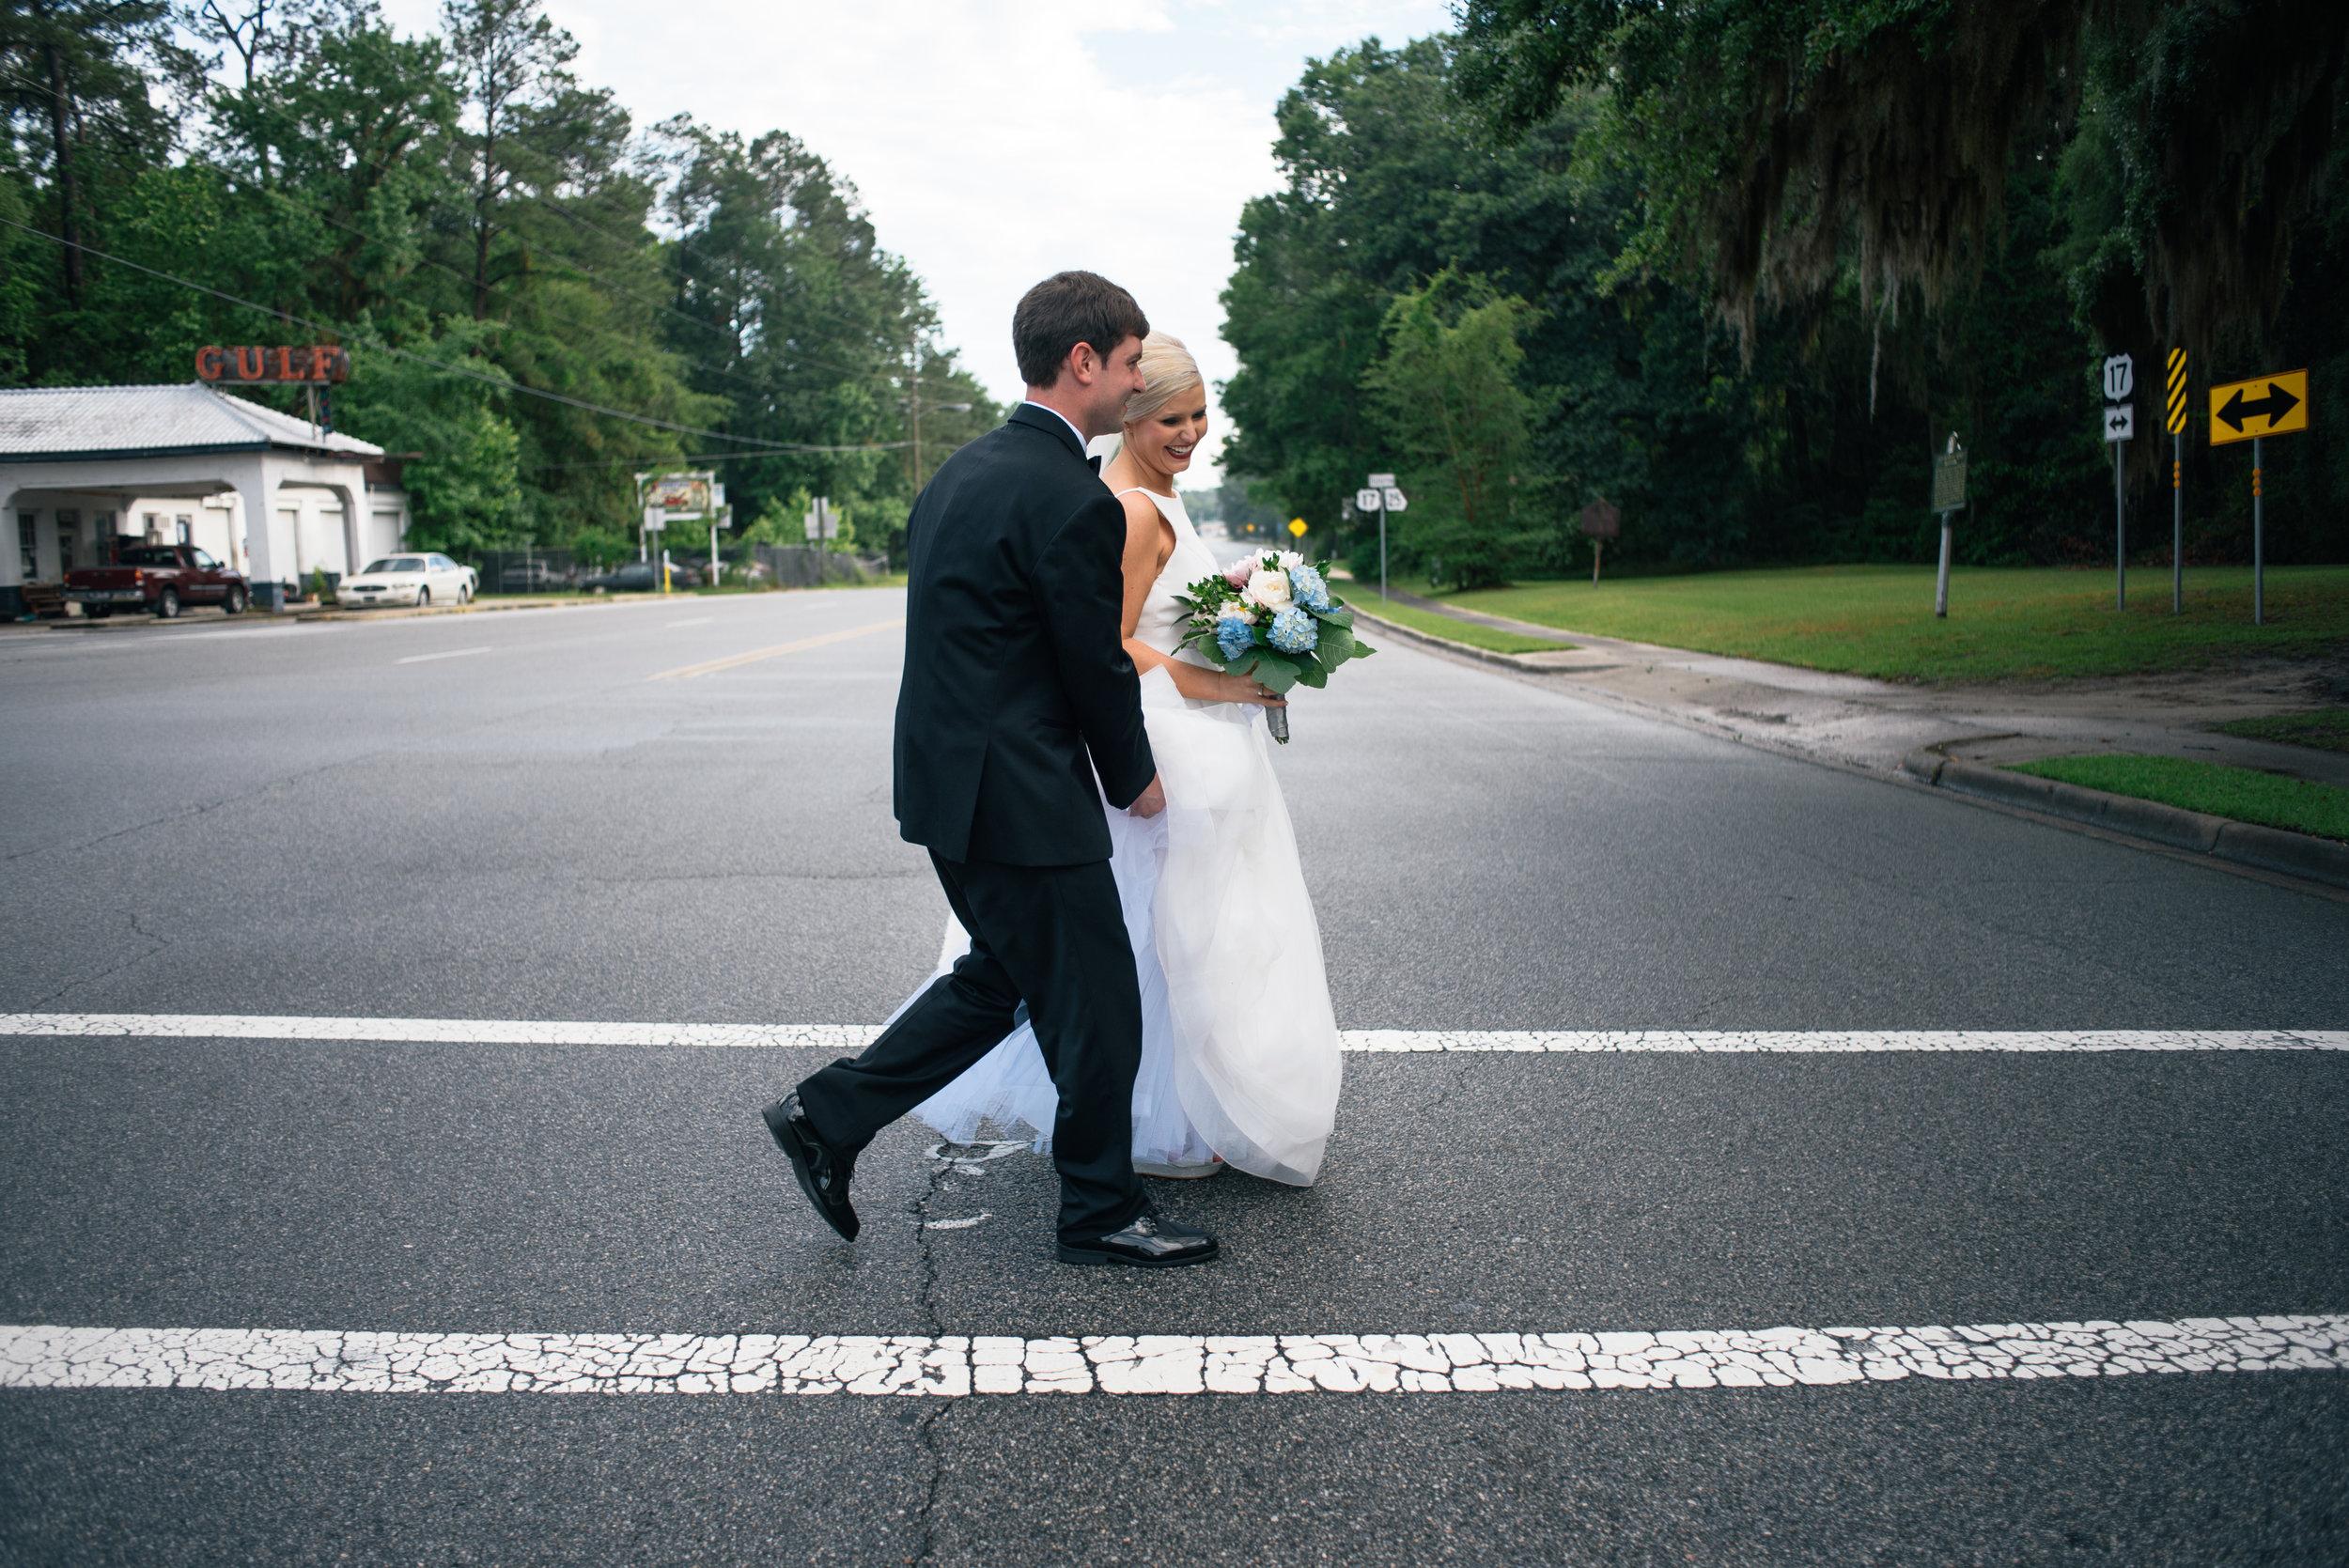 ali-and-jared-savannah-georgia-may-2017-wedding-meg-hill-photo-(473of760).jpg